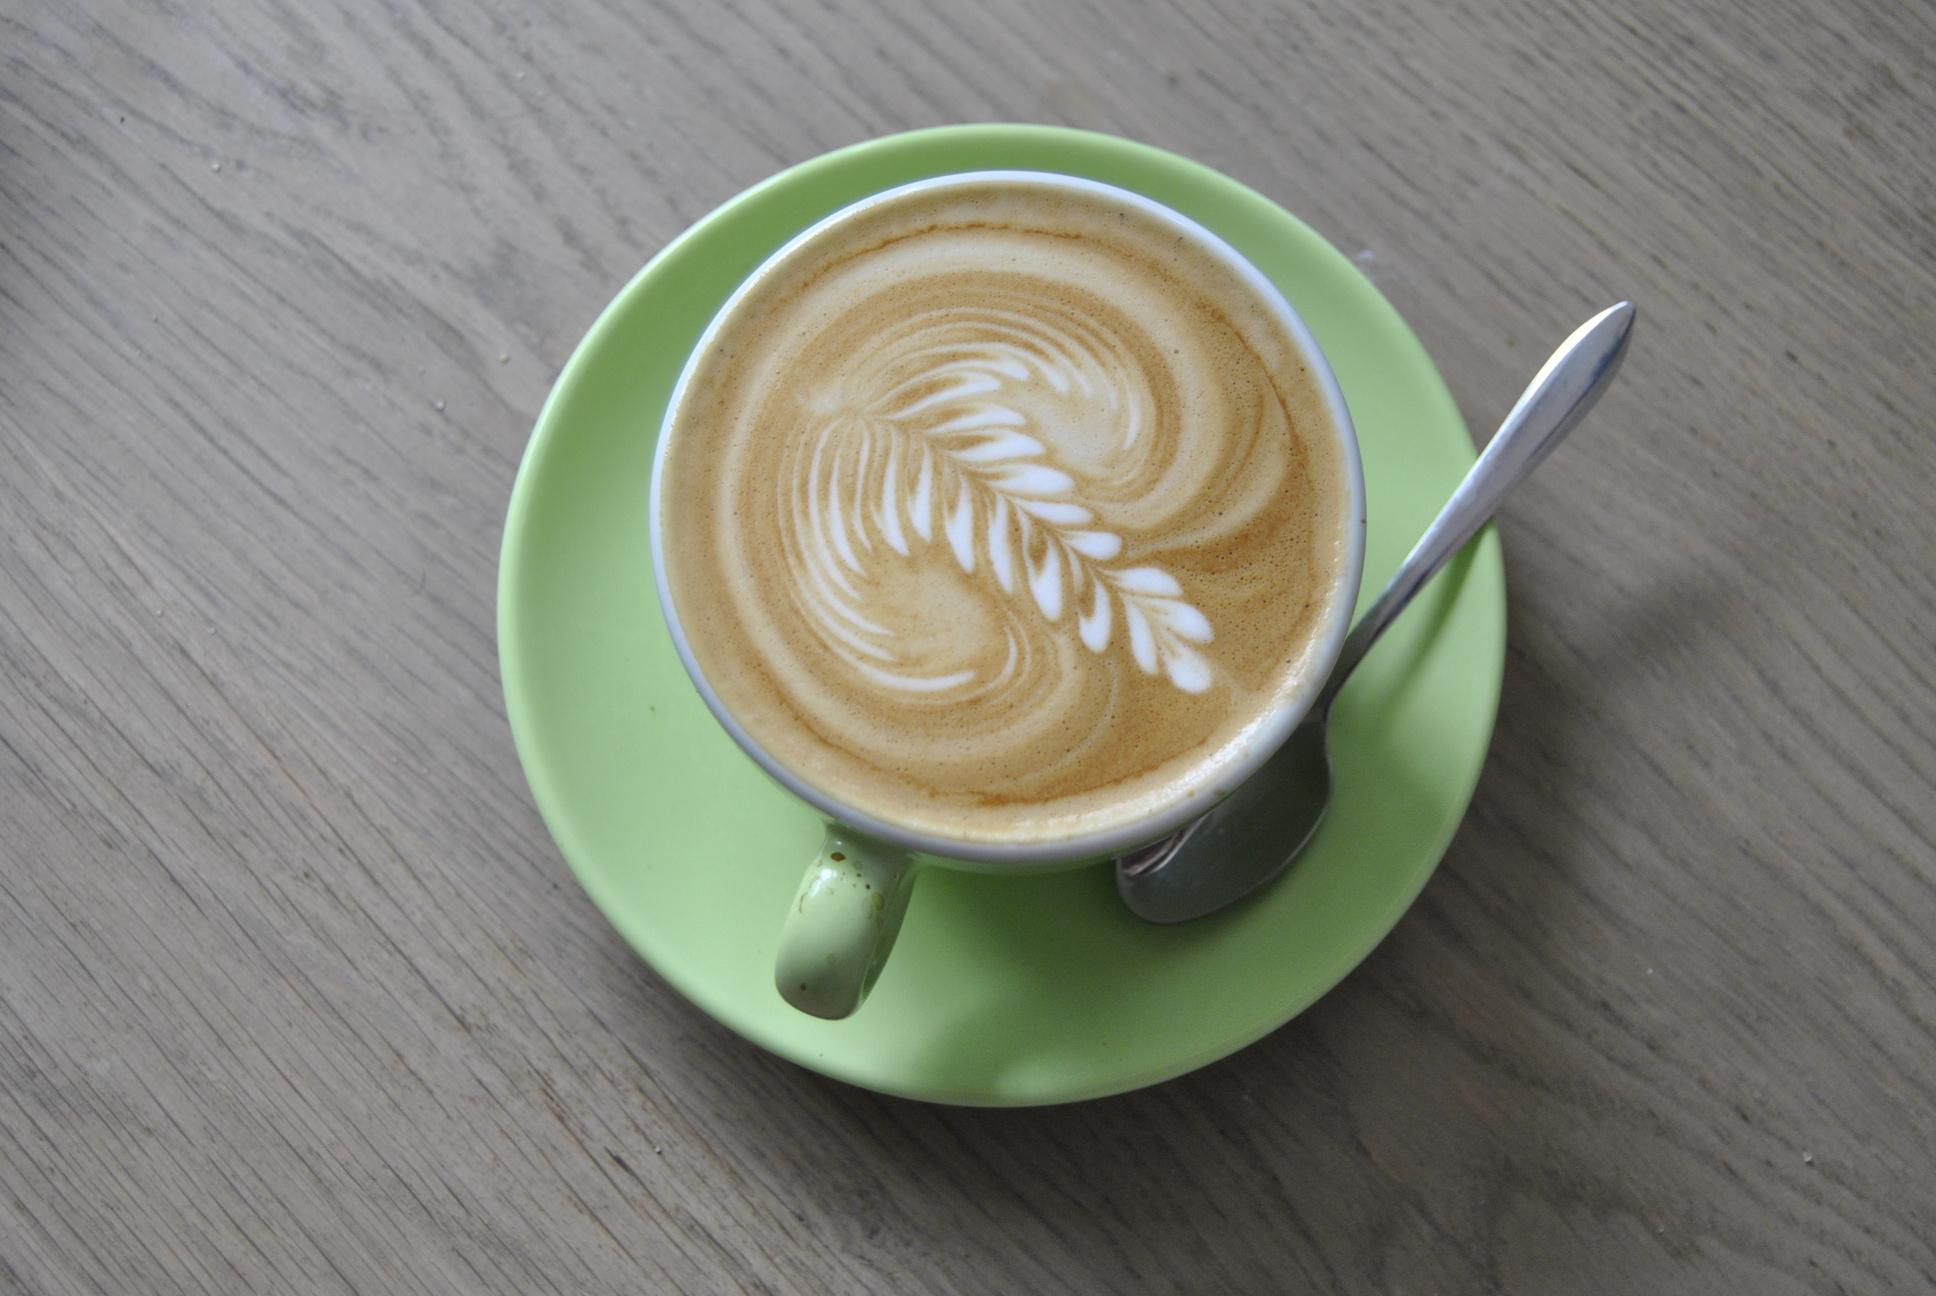 cafe creme fondation